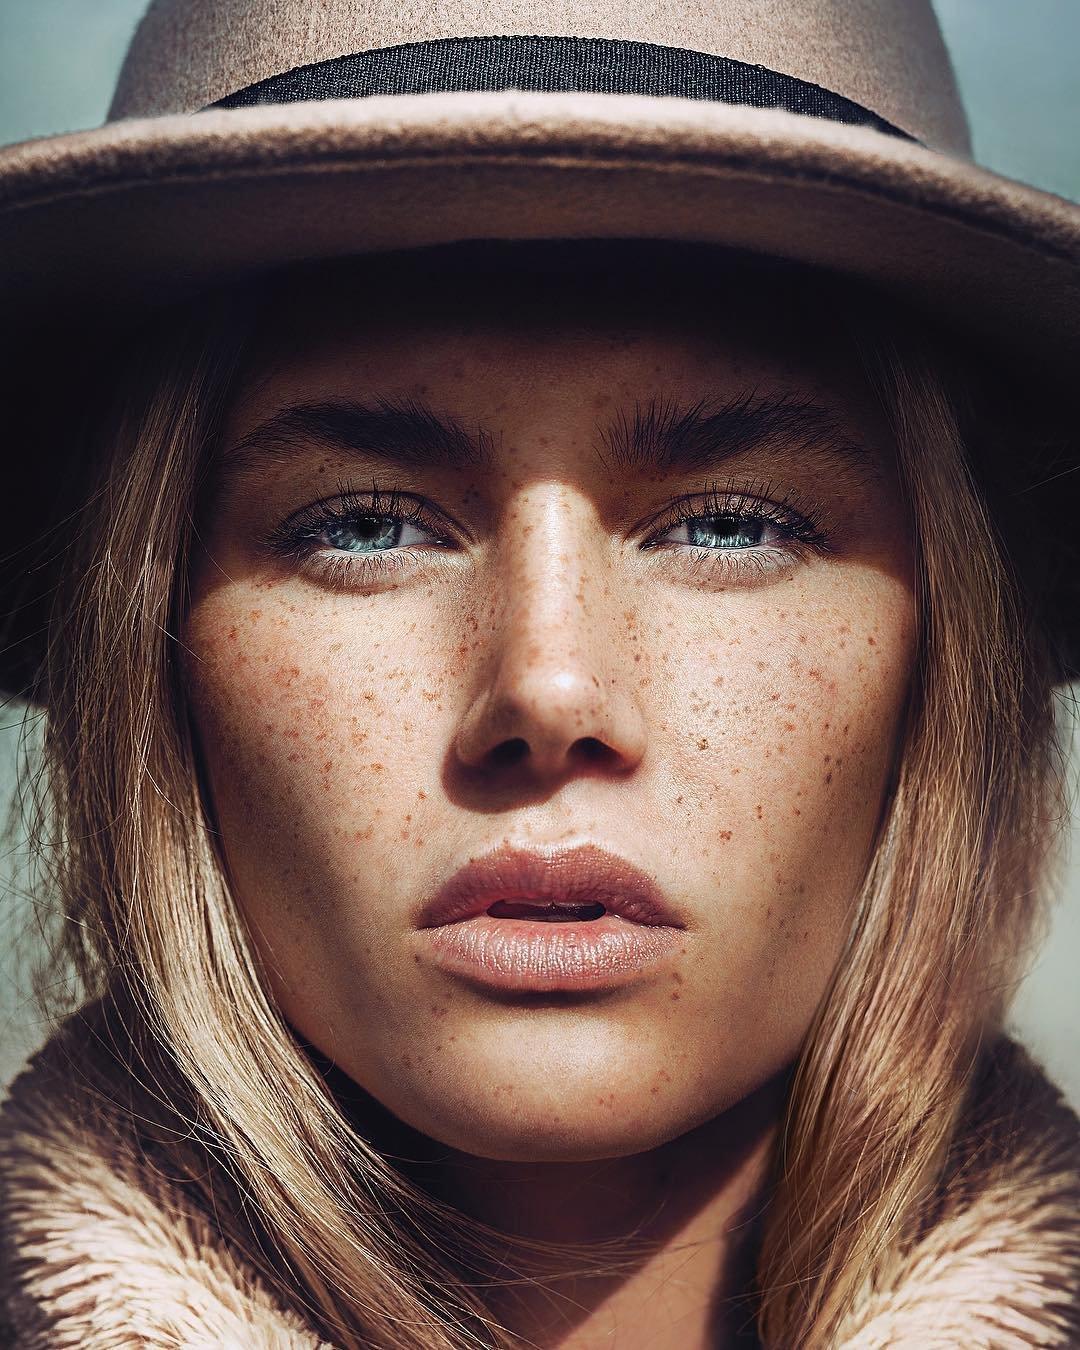 Lars Fink Rasmussen Commercial Photography